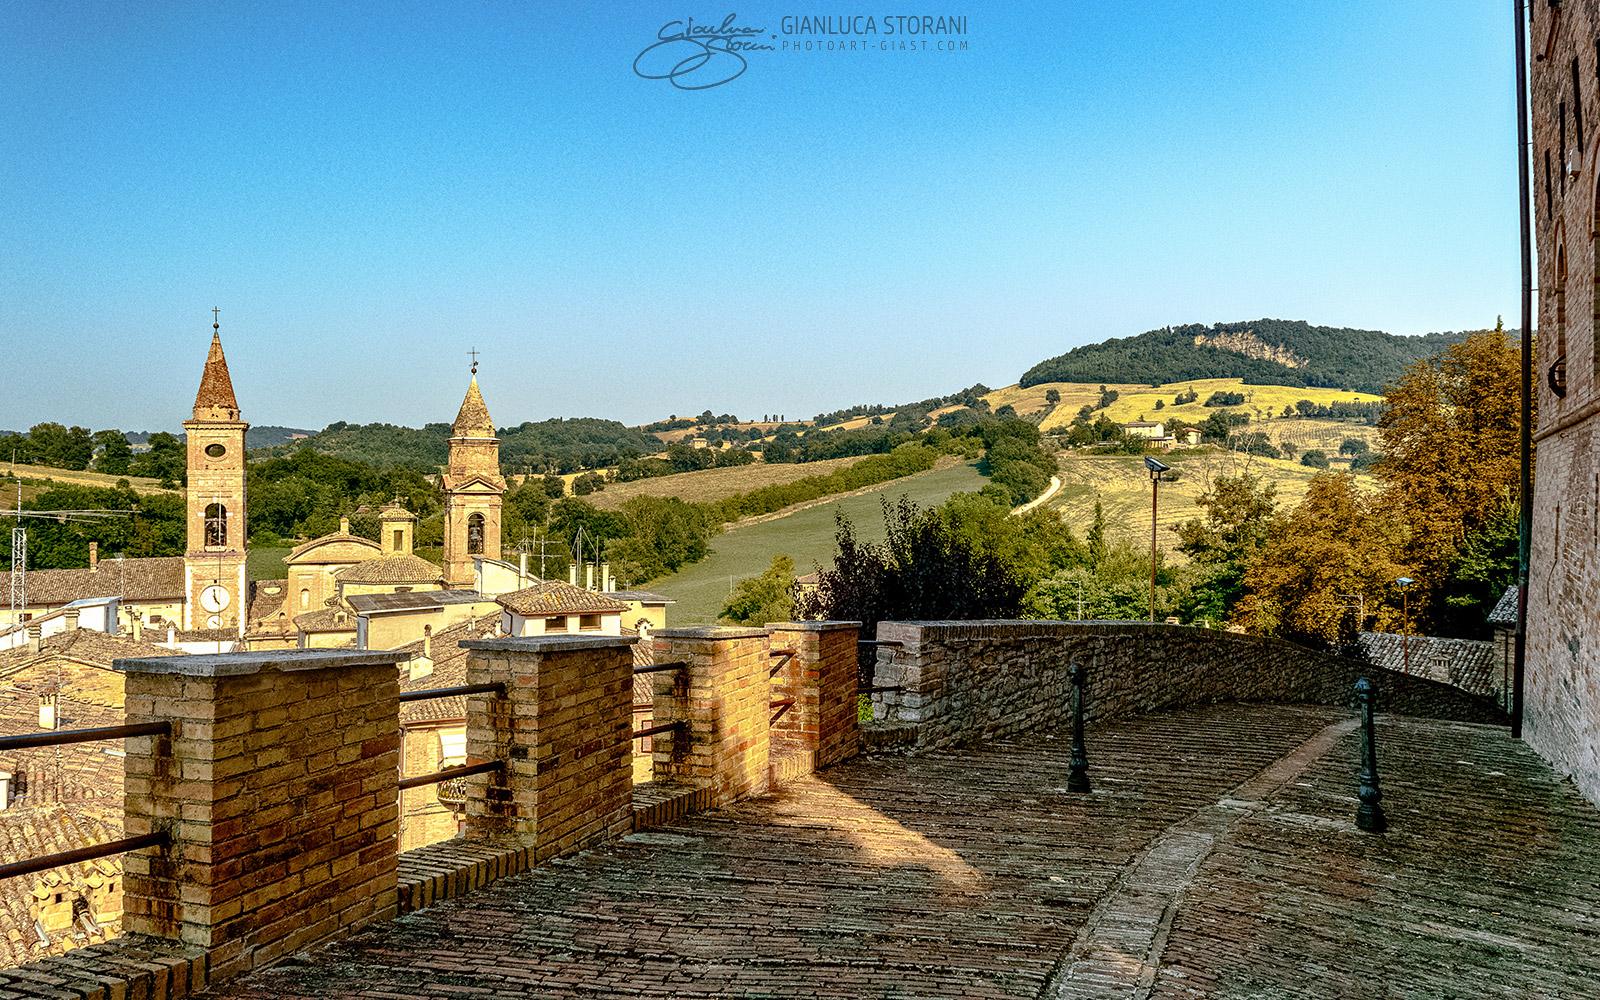 Le due torri di Caldarola - Gianluca Storani Photo Art (ID: 1-4711)